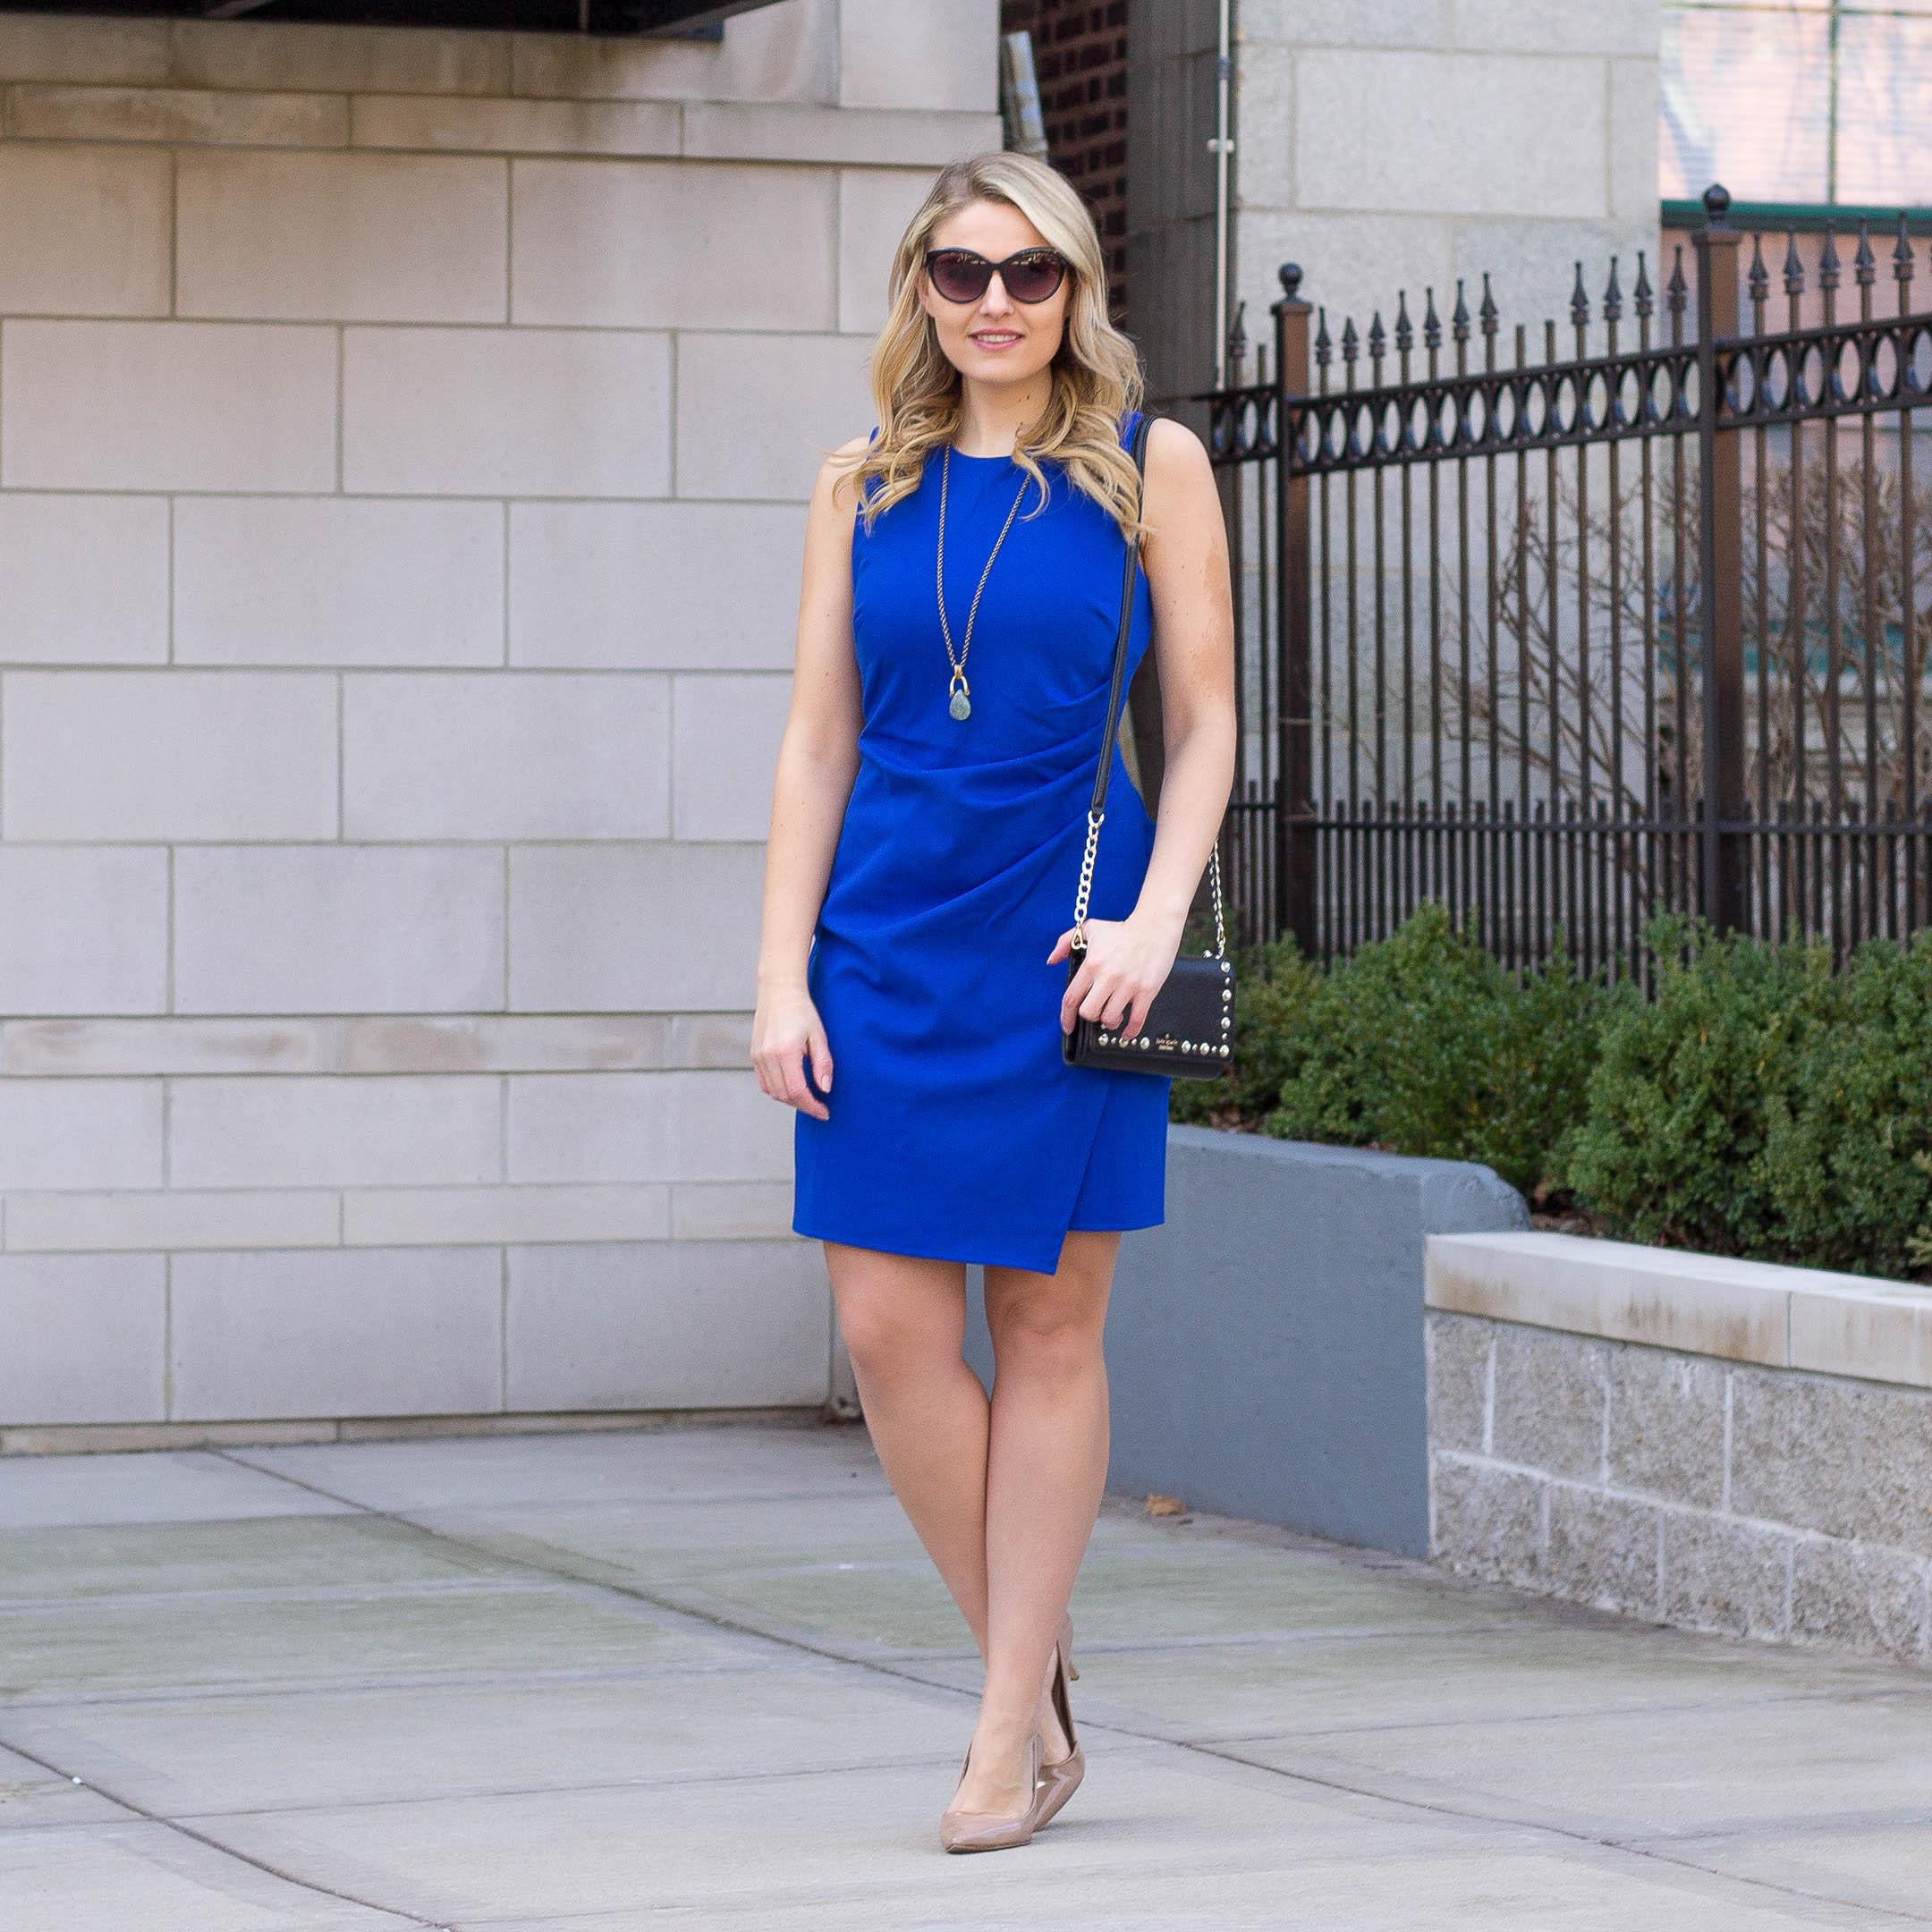 A Lark & Co Sheath Dress in Cobalt Blue for under $75